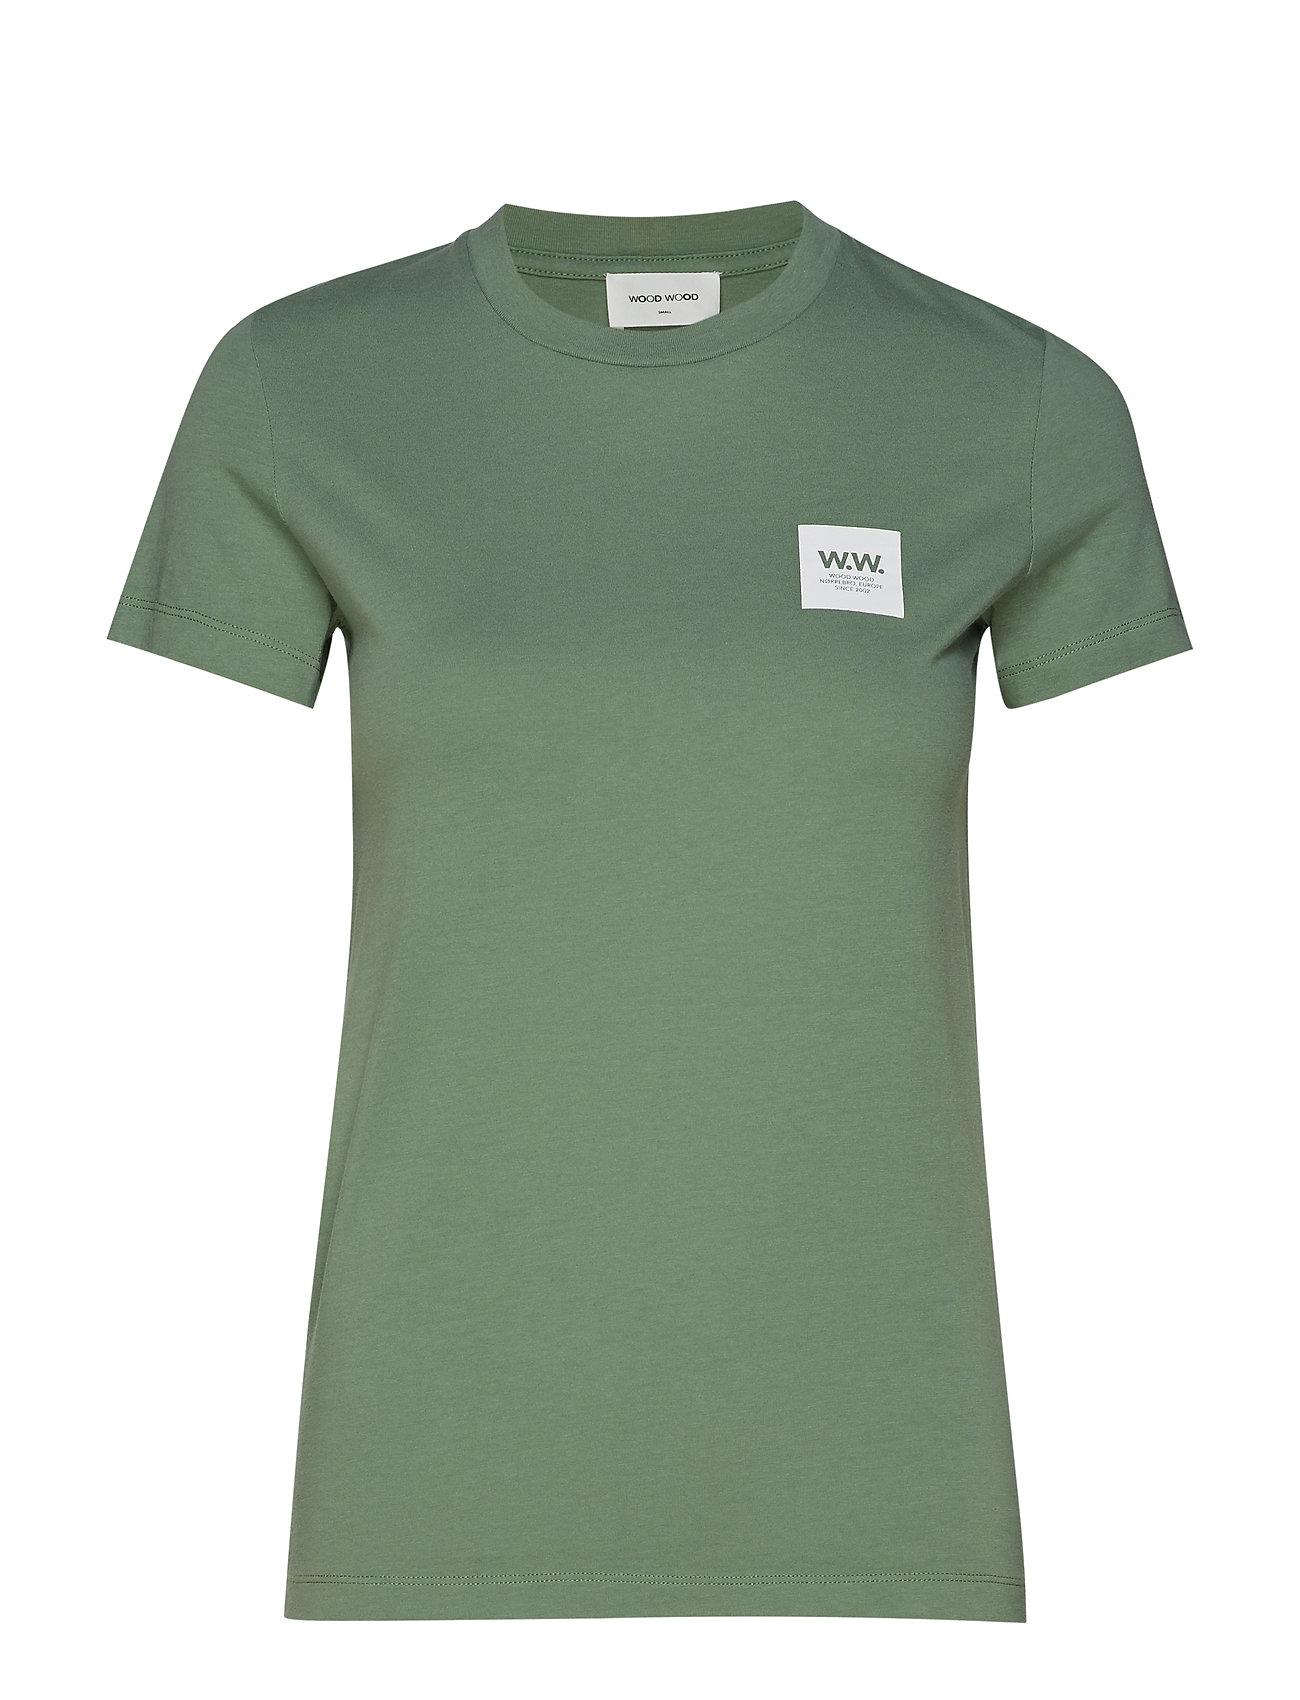 Wood Wood Eden T-shirt - DUSTY GREEN